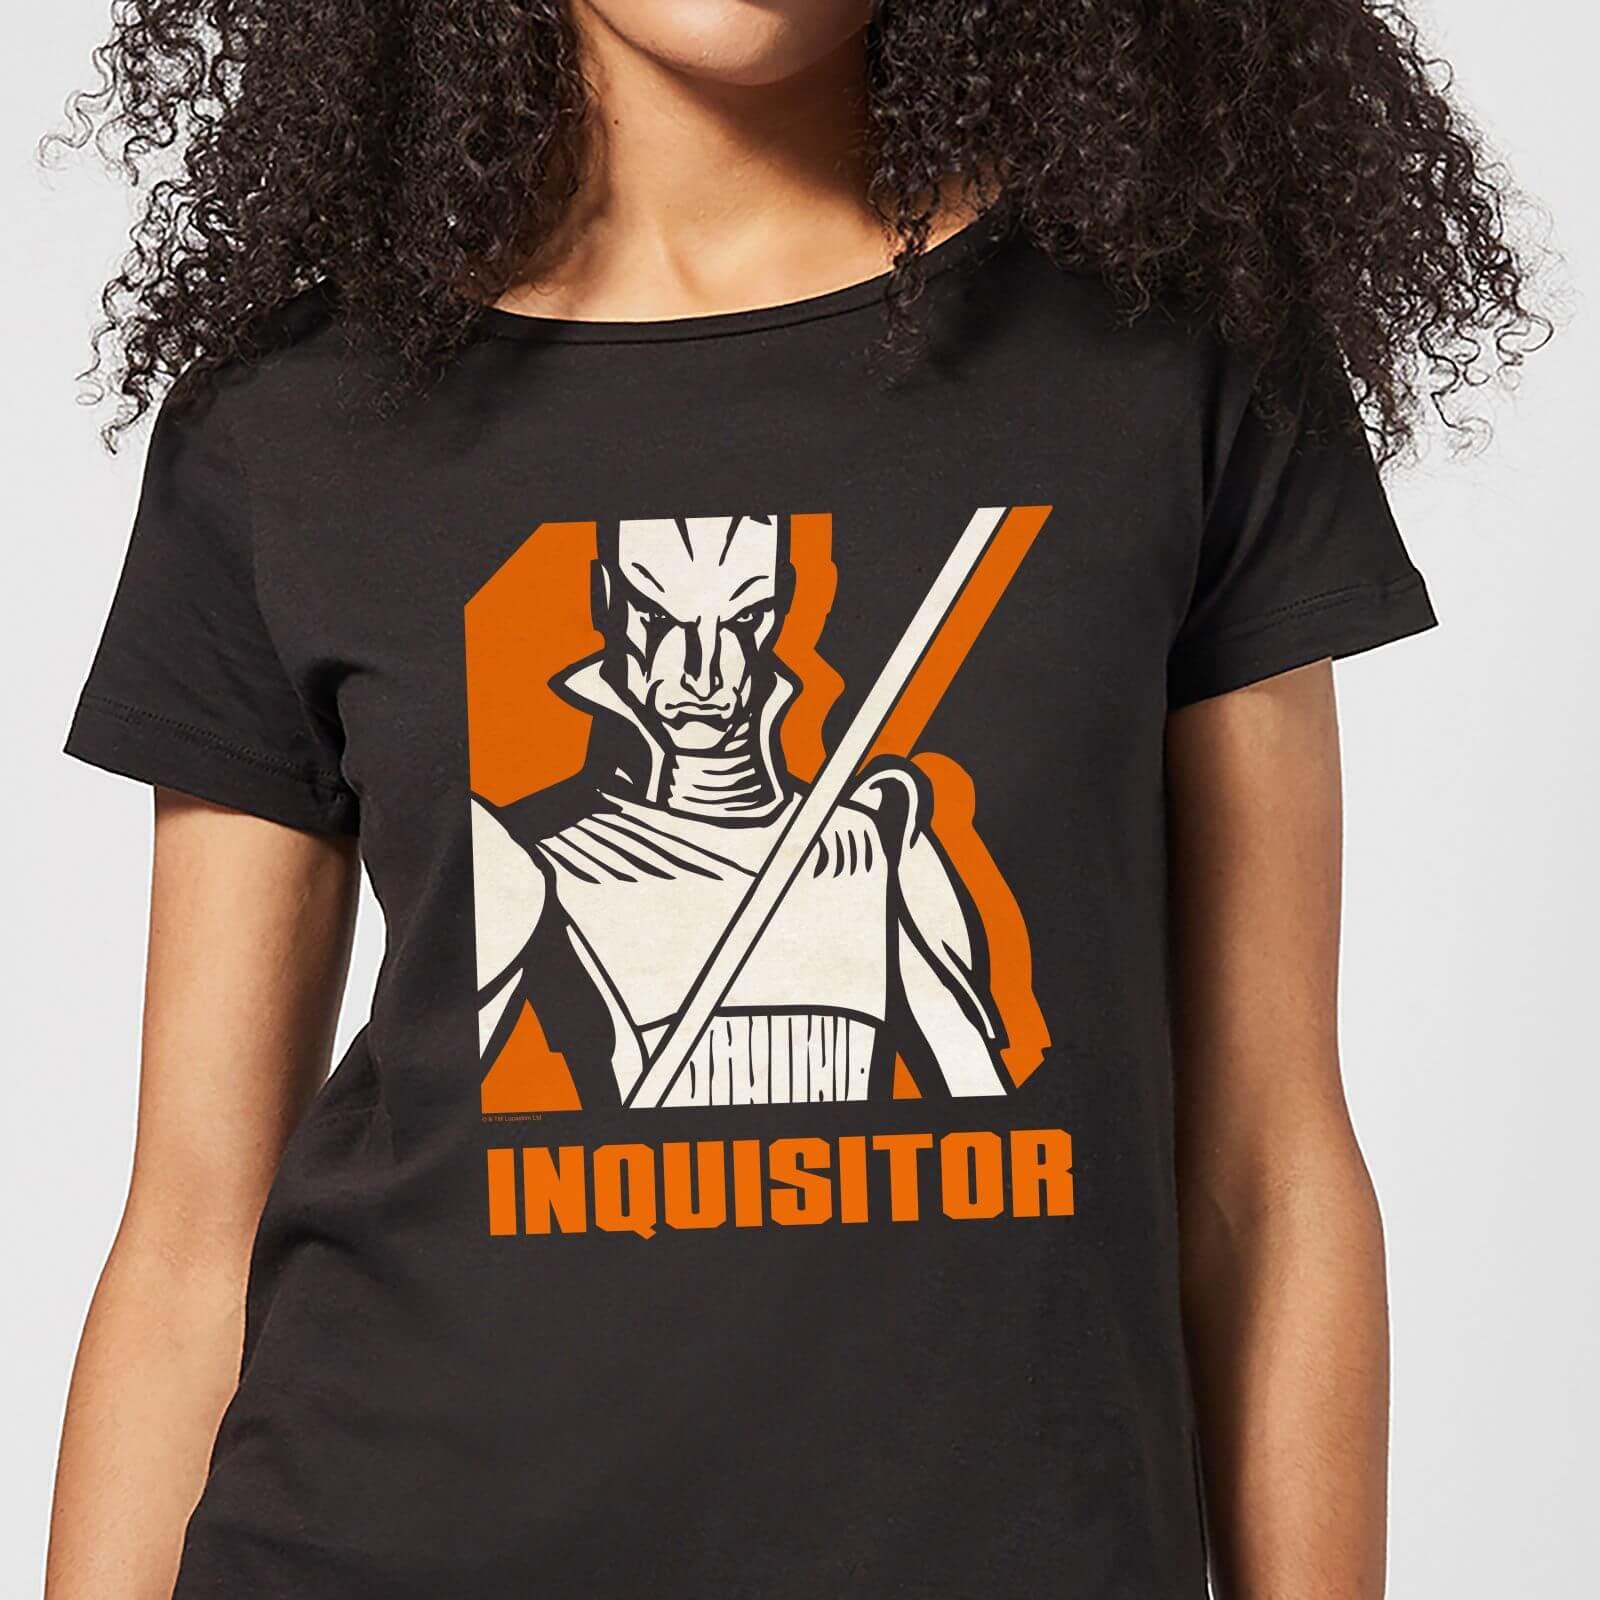 Star Wars Rebels Inquisitor Women's T-Shirt - Black